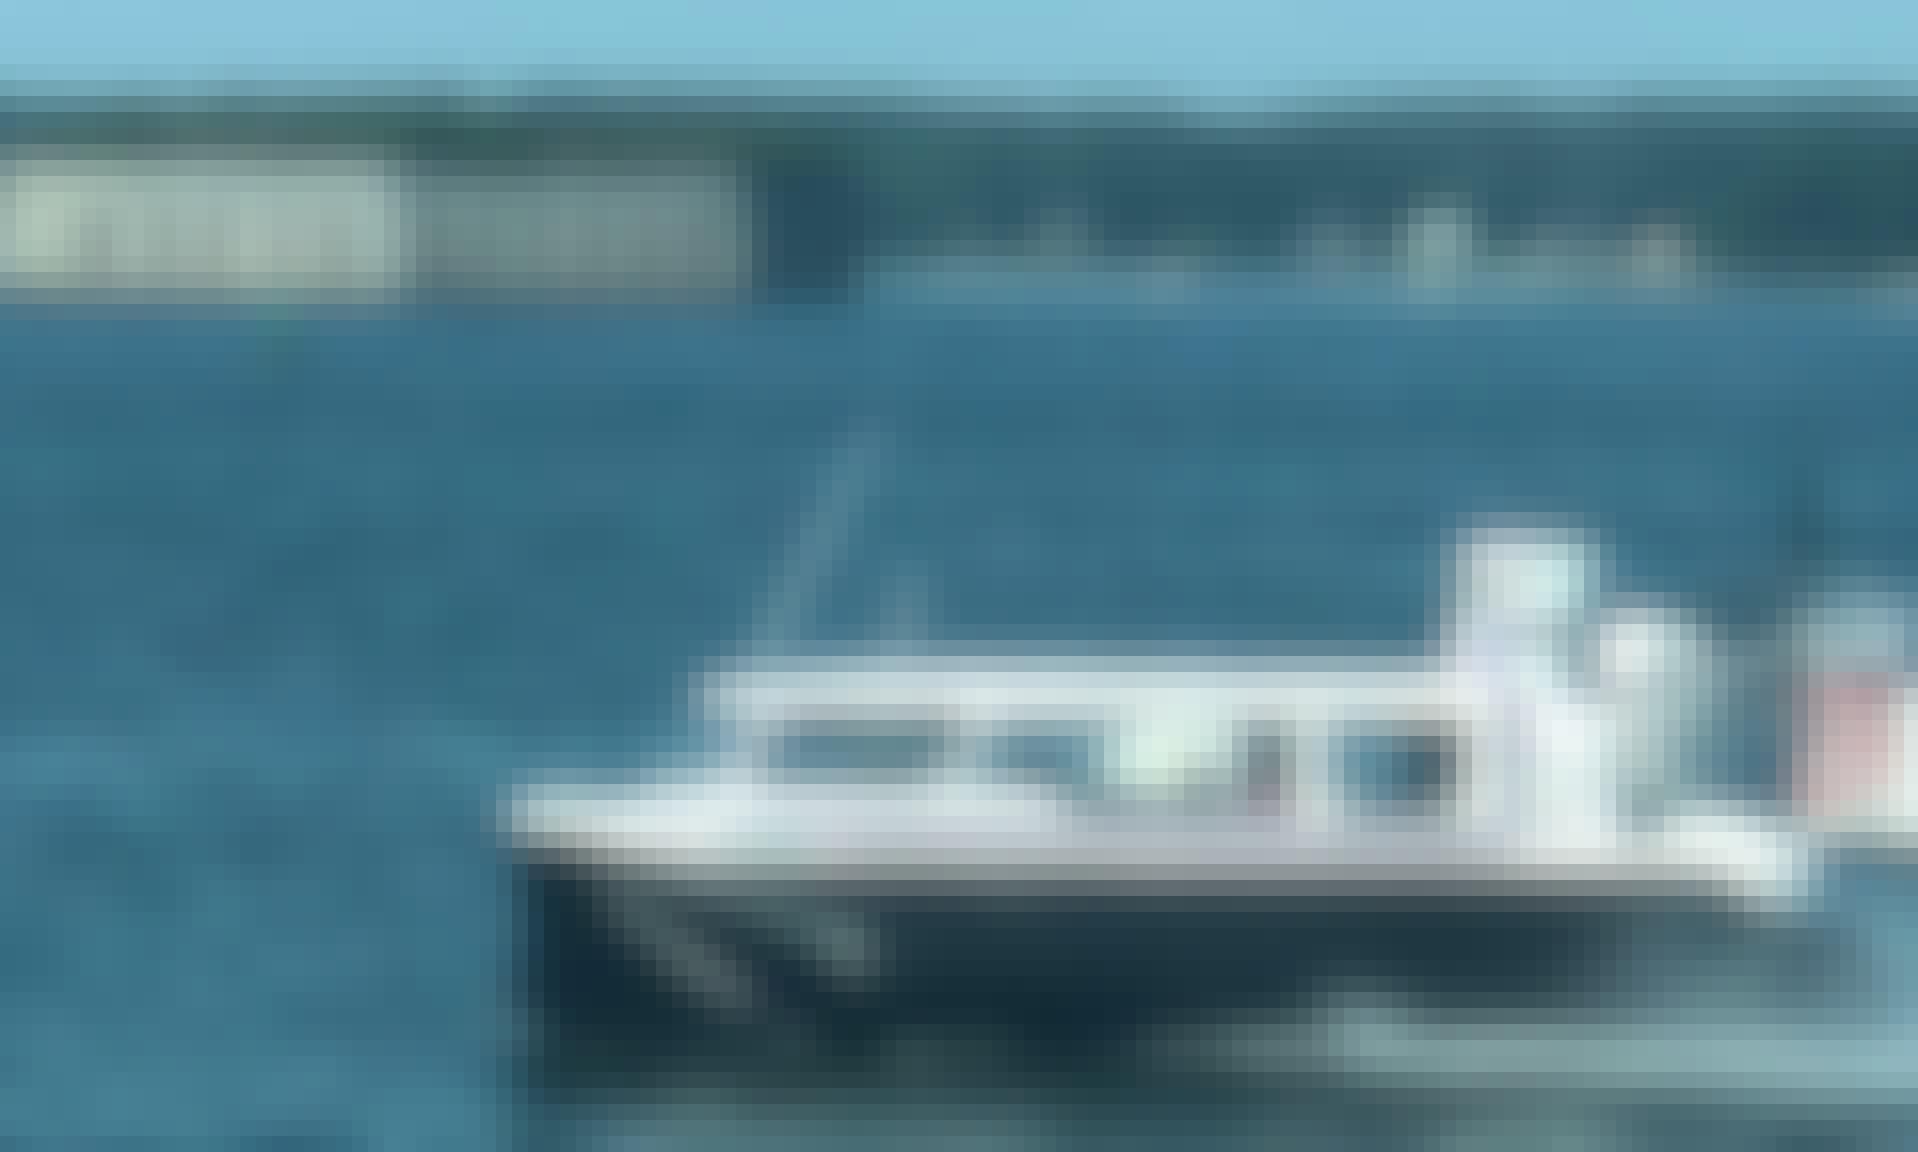 Book the Amphibious Marine, Explorer 24 Hovercraft in Portland, Maine